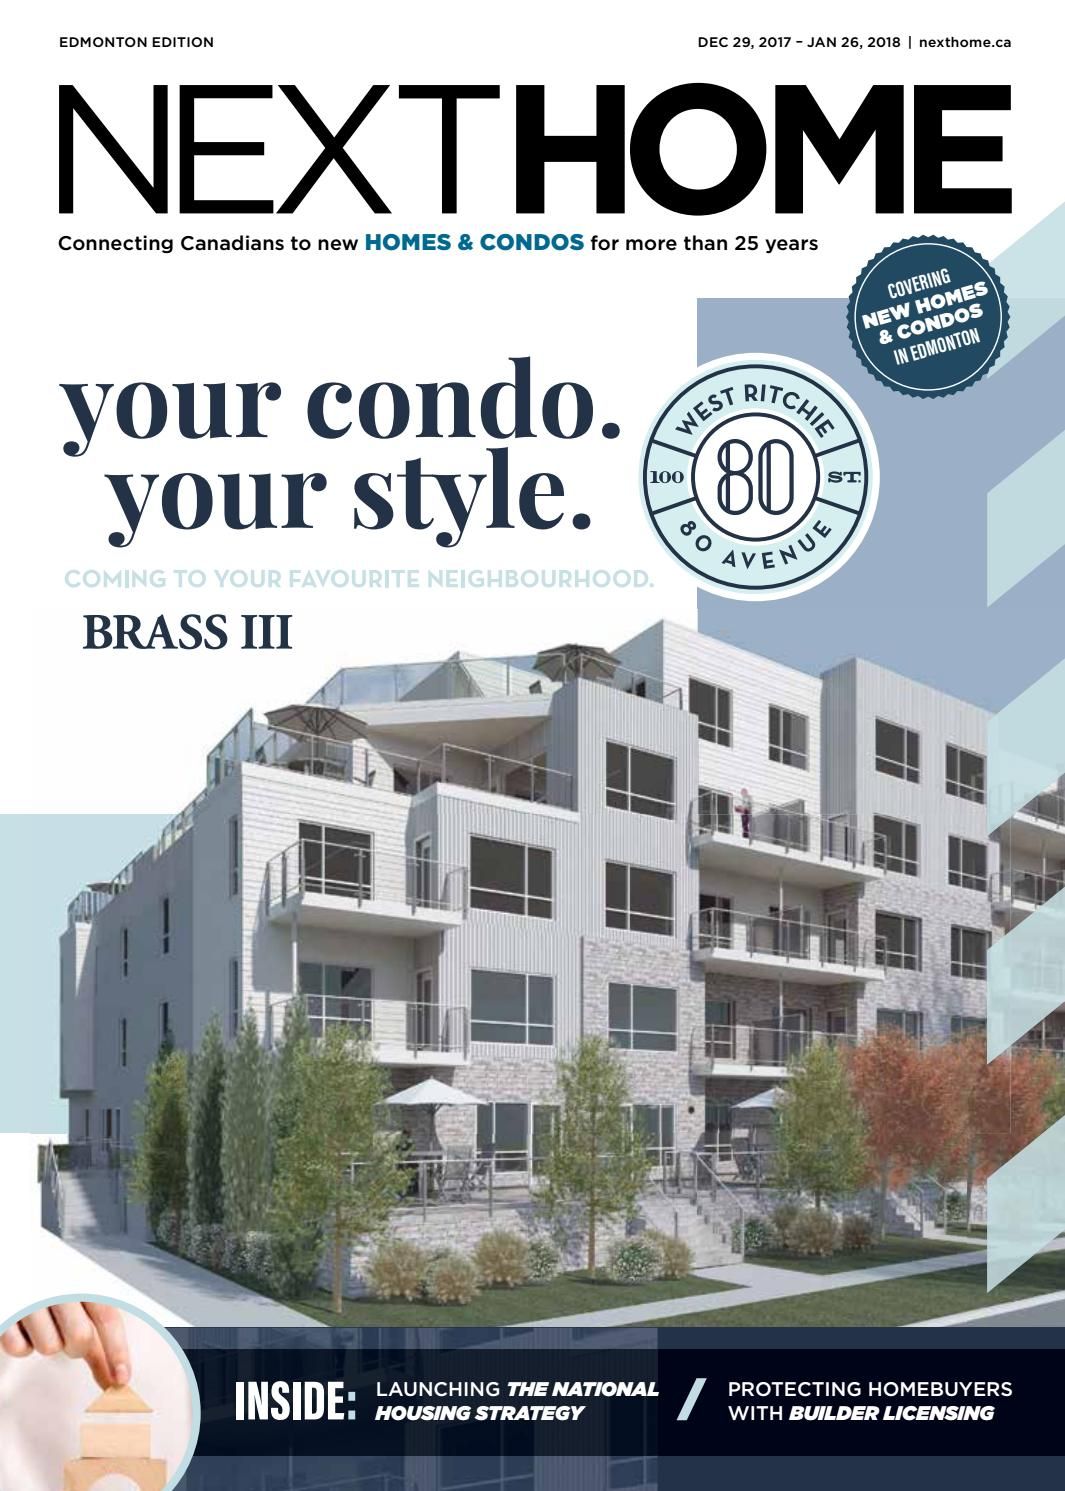 Edmonton New Condo Guide - Dec 29, 2017 by NextHome - issuu